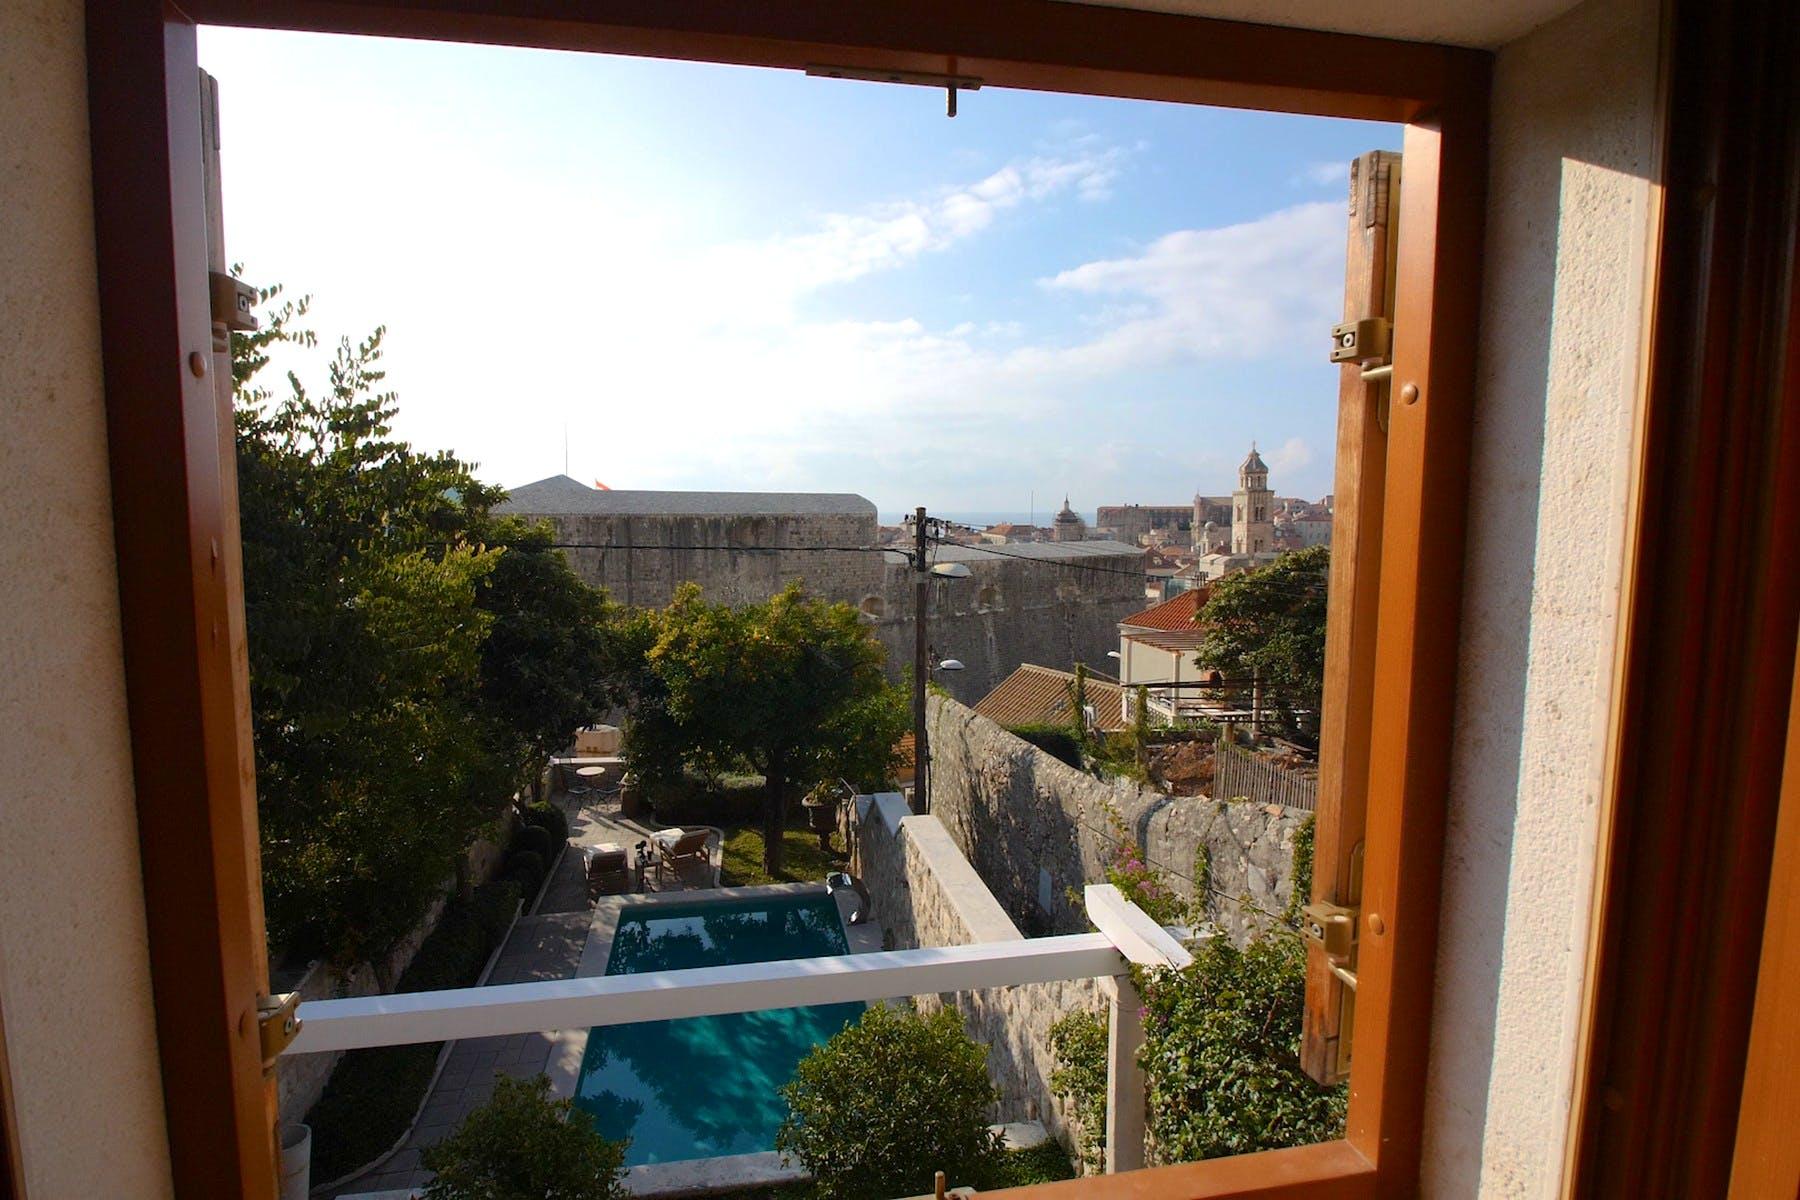 Picturesque view of Dubrovnik and pristine Adriatic